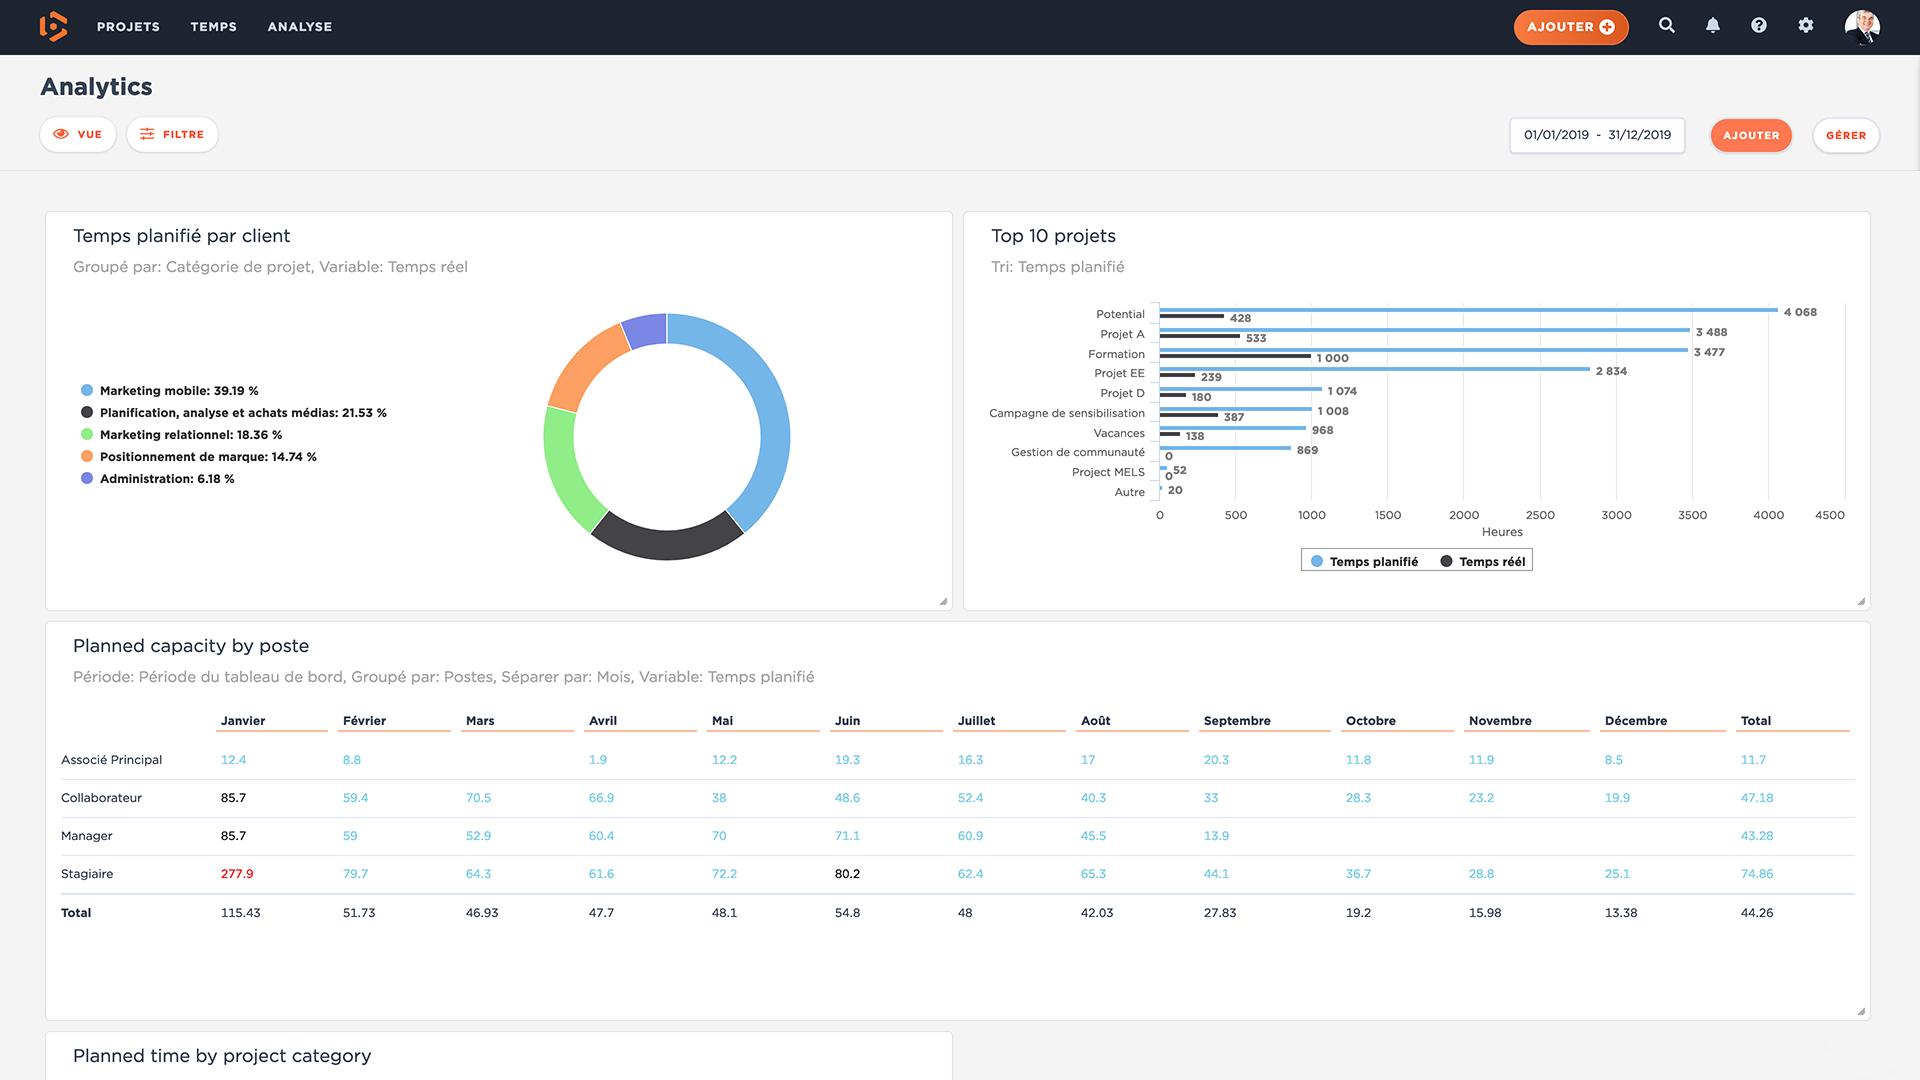 beeye-dashboard-analytics